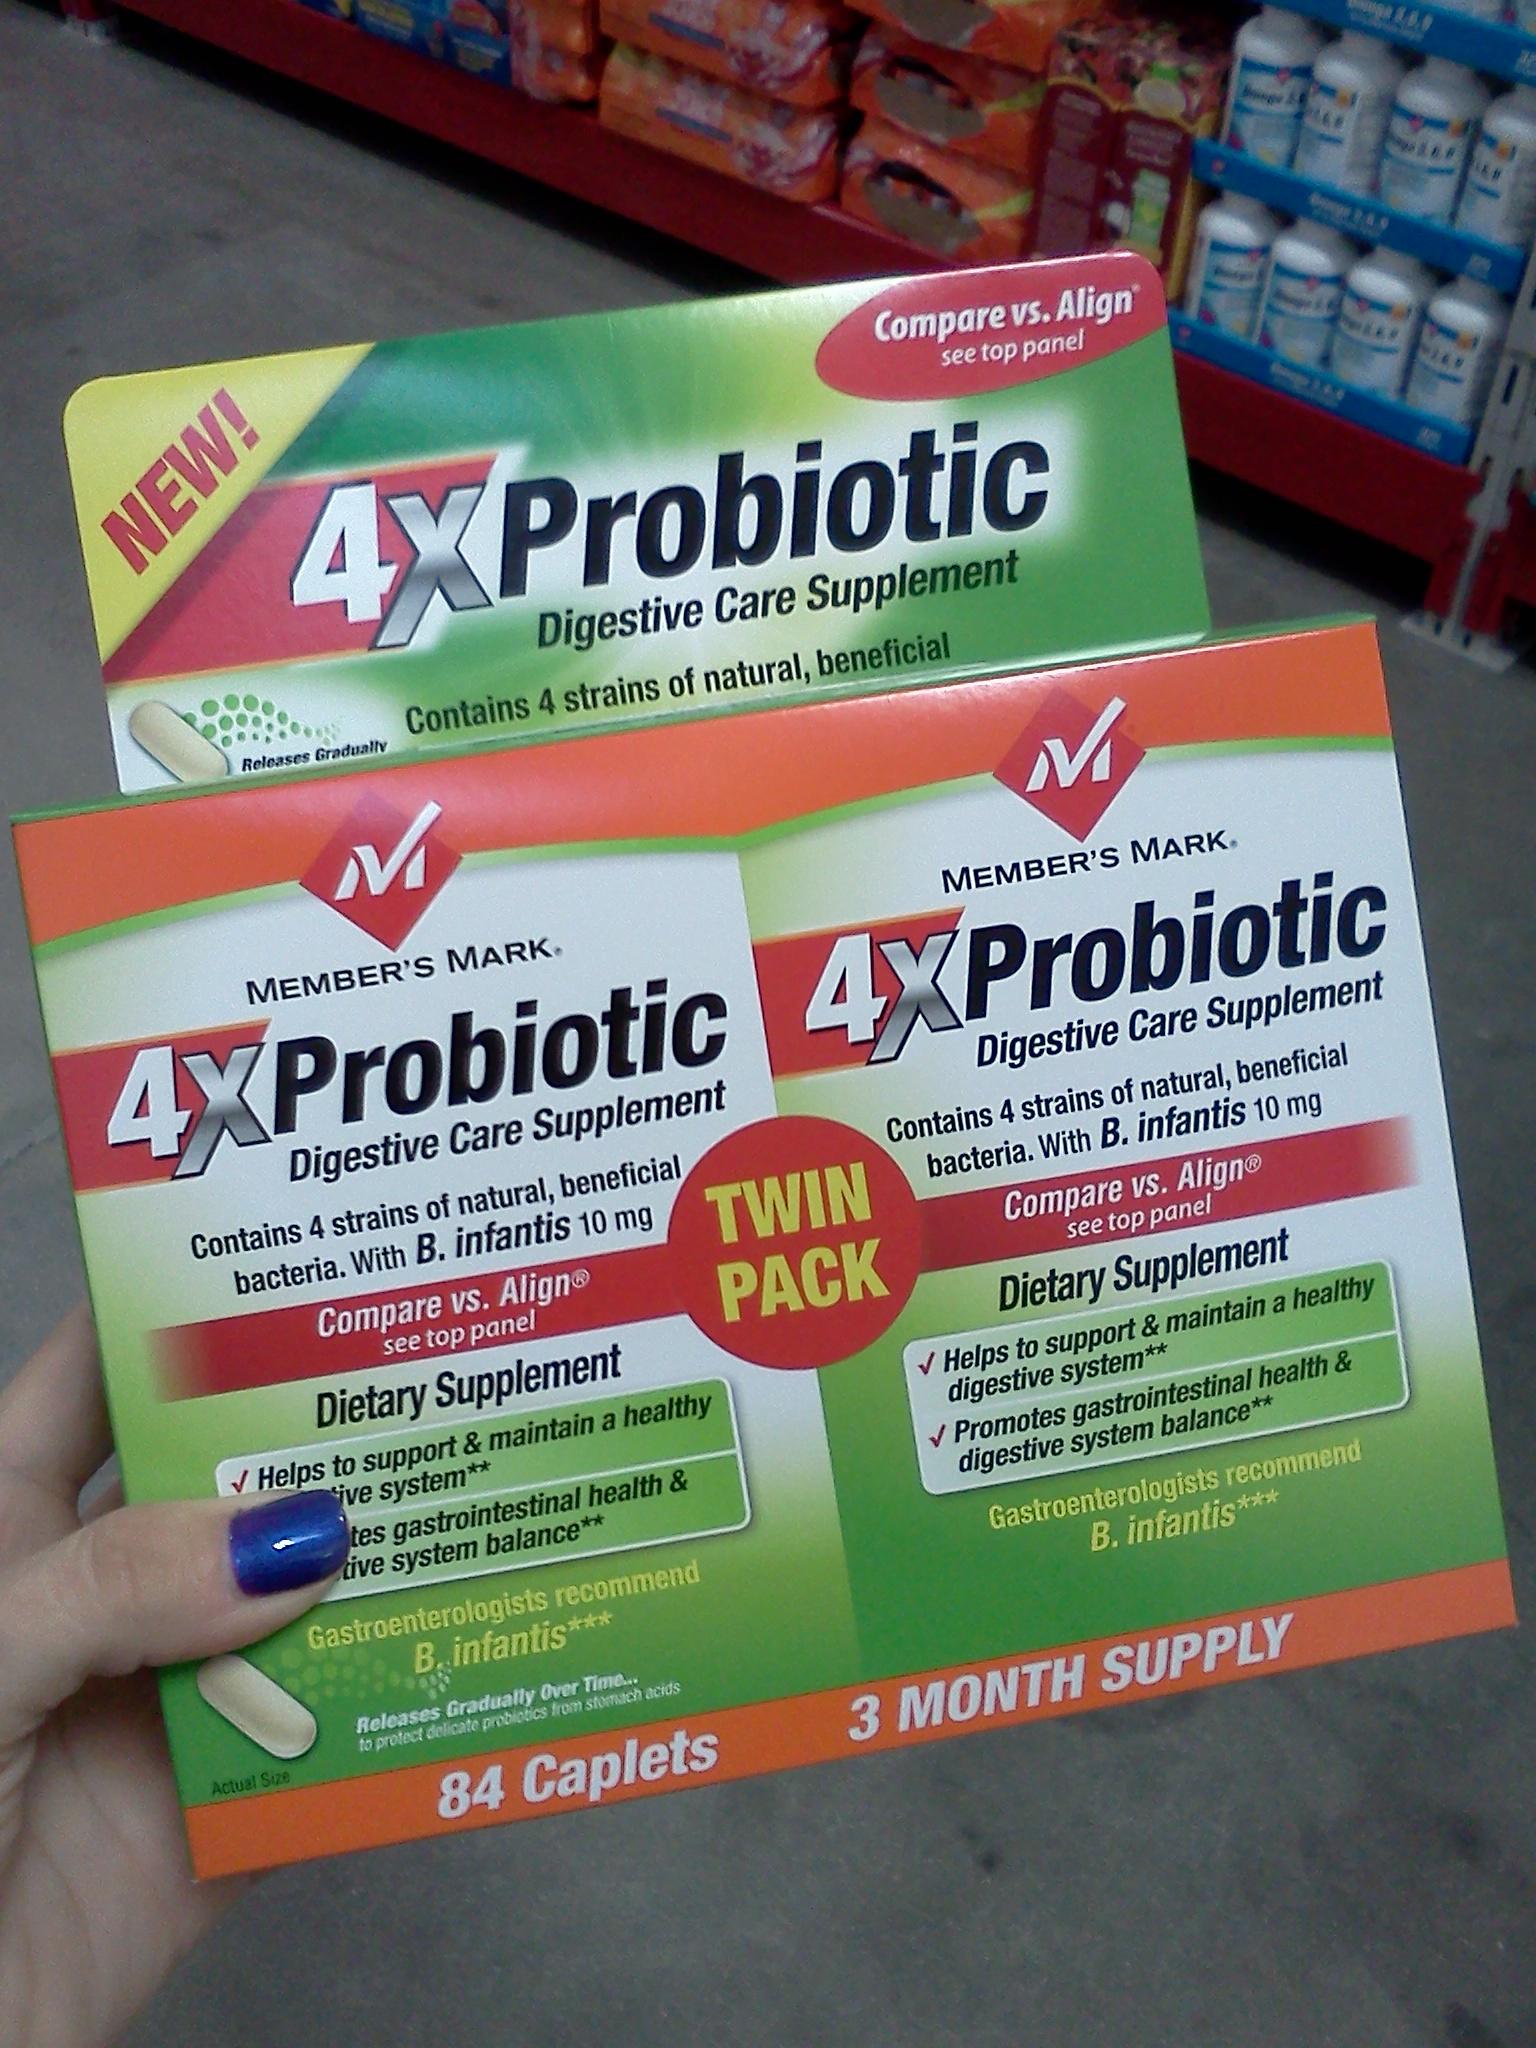 Member's Mark Probiotic